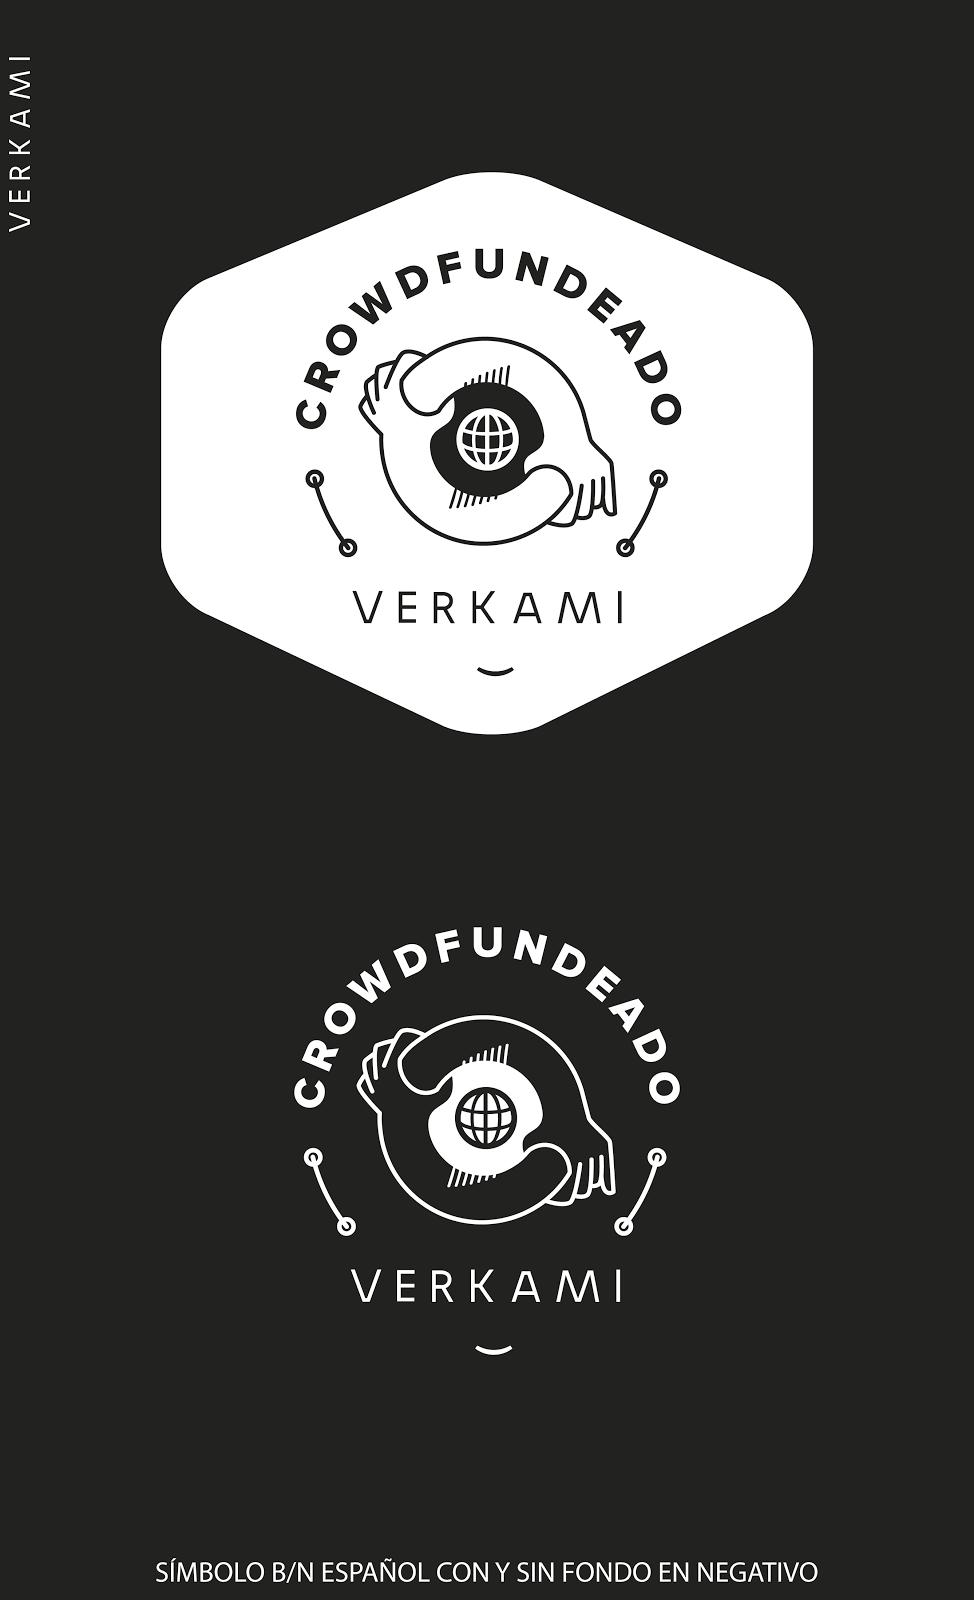 ¡Crowdfunding conseguido!